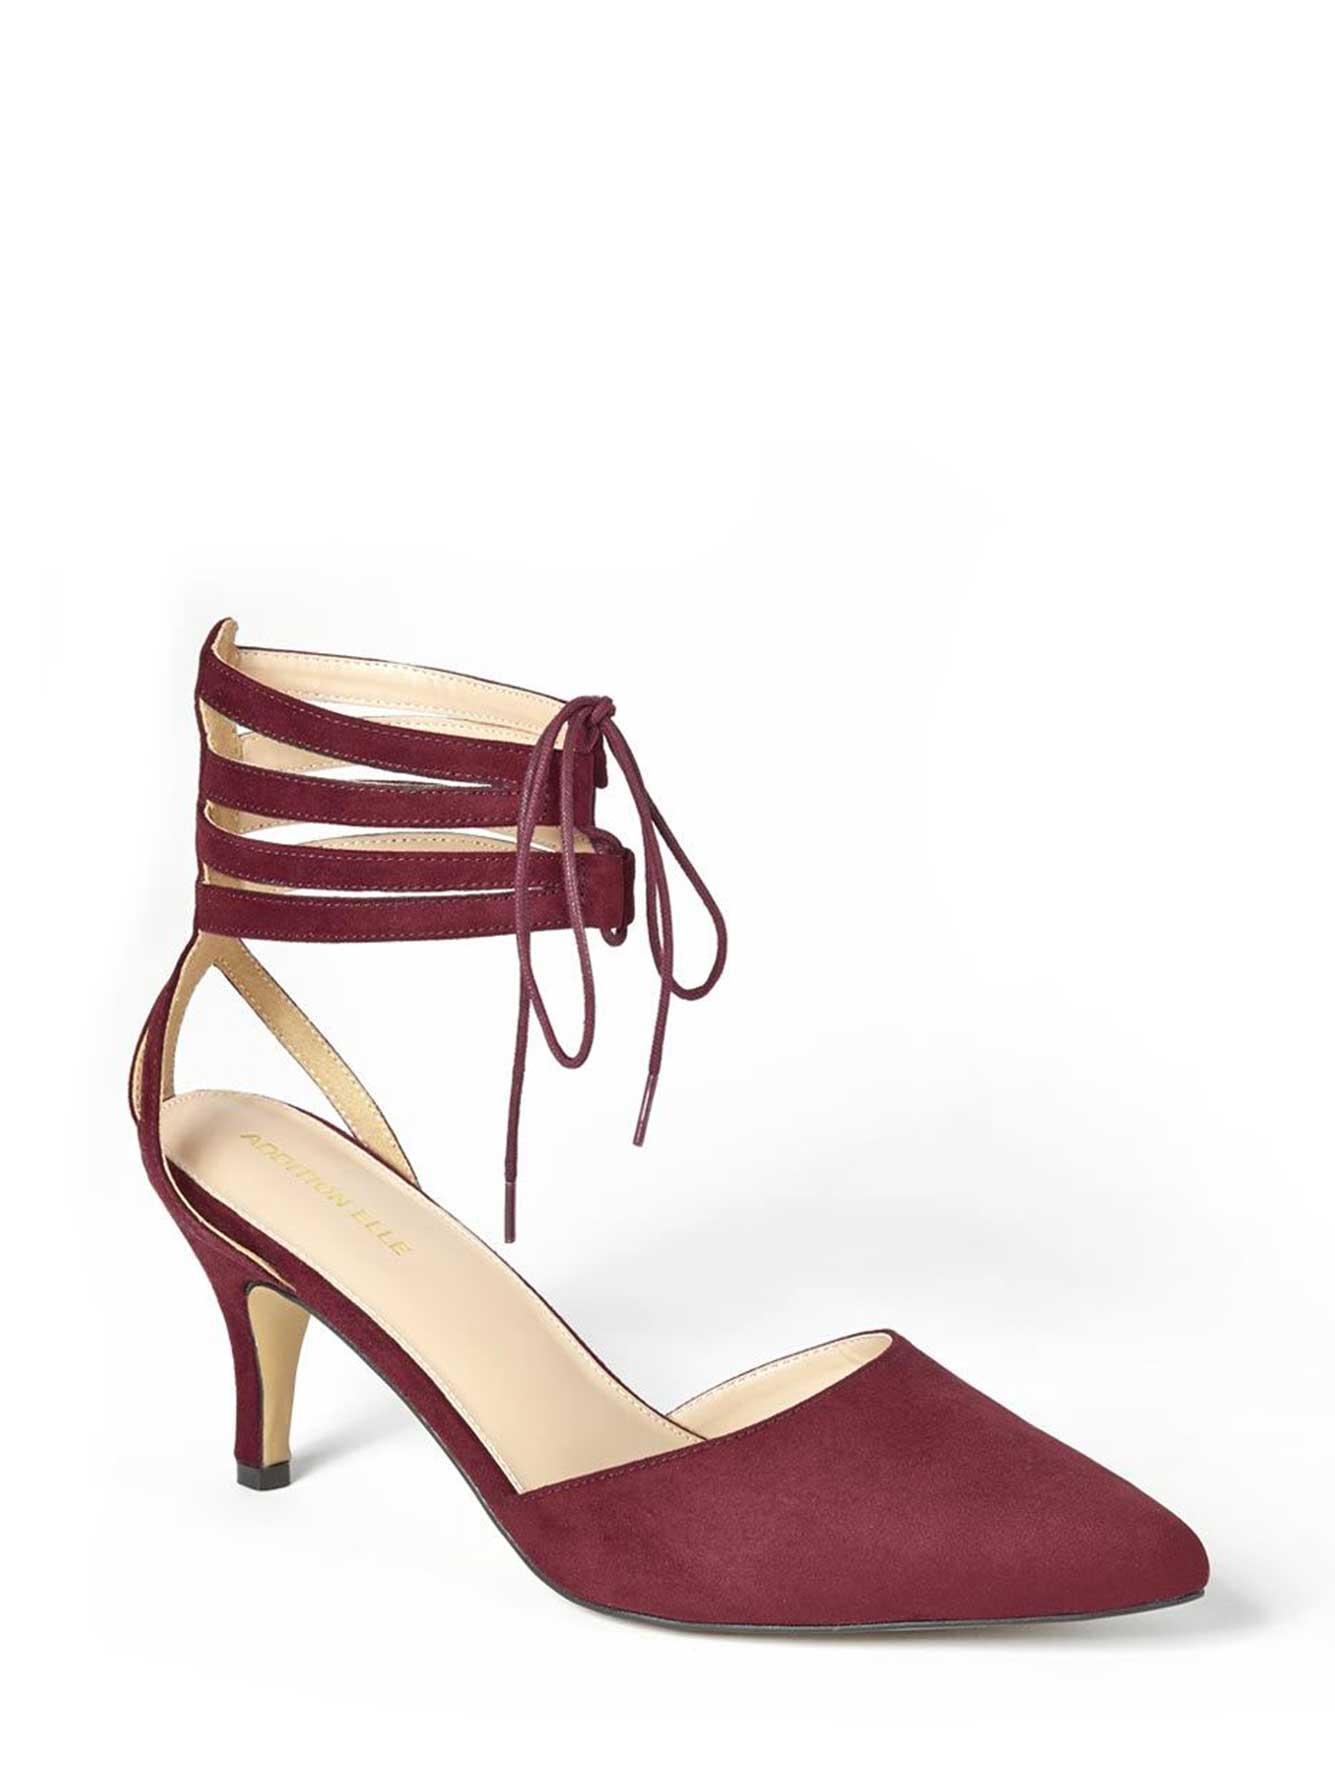 Strap Up Heels - Additionelle